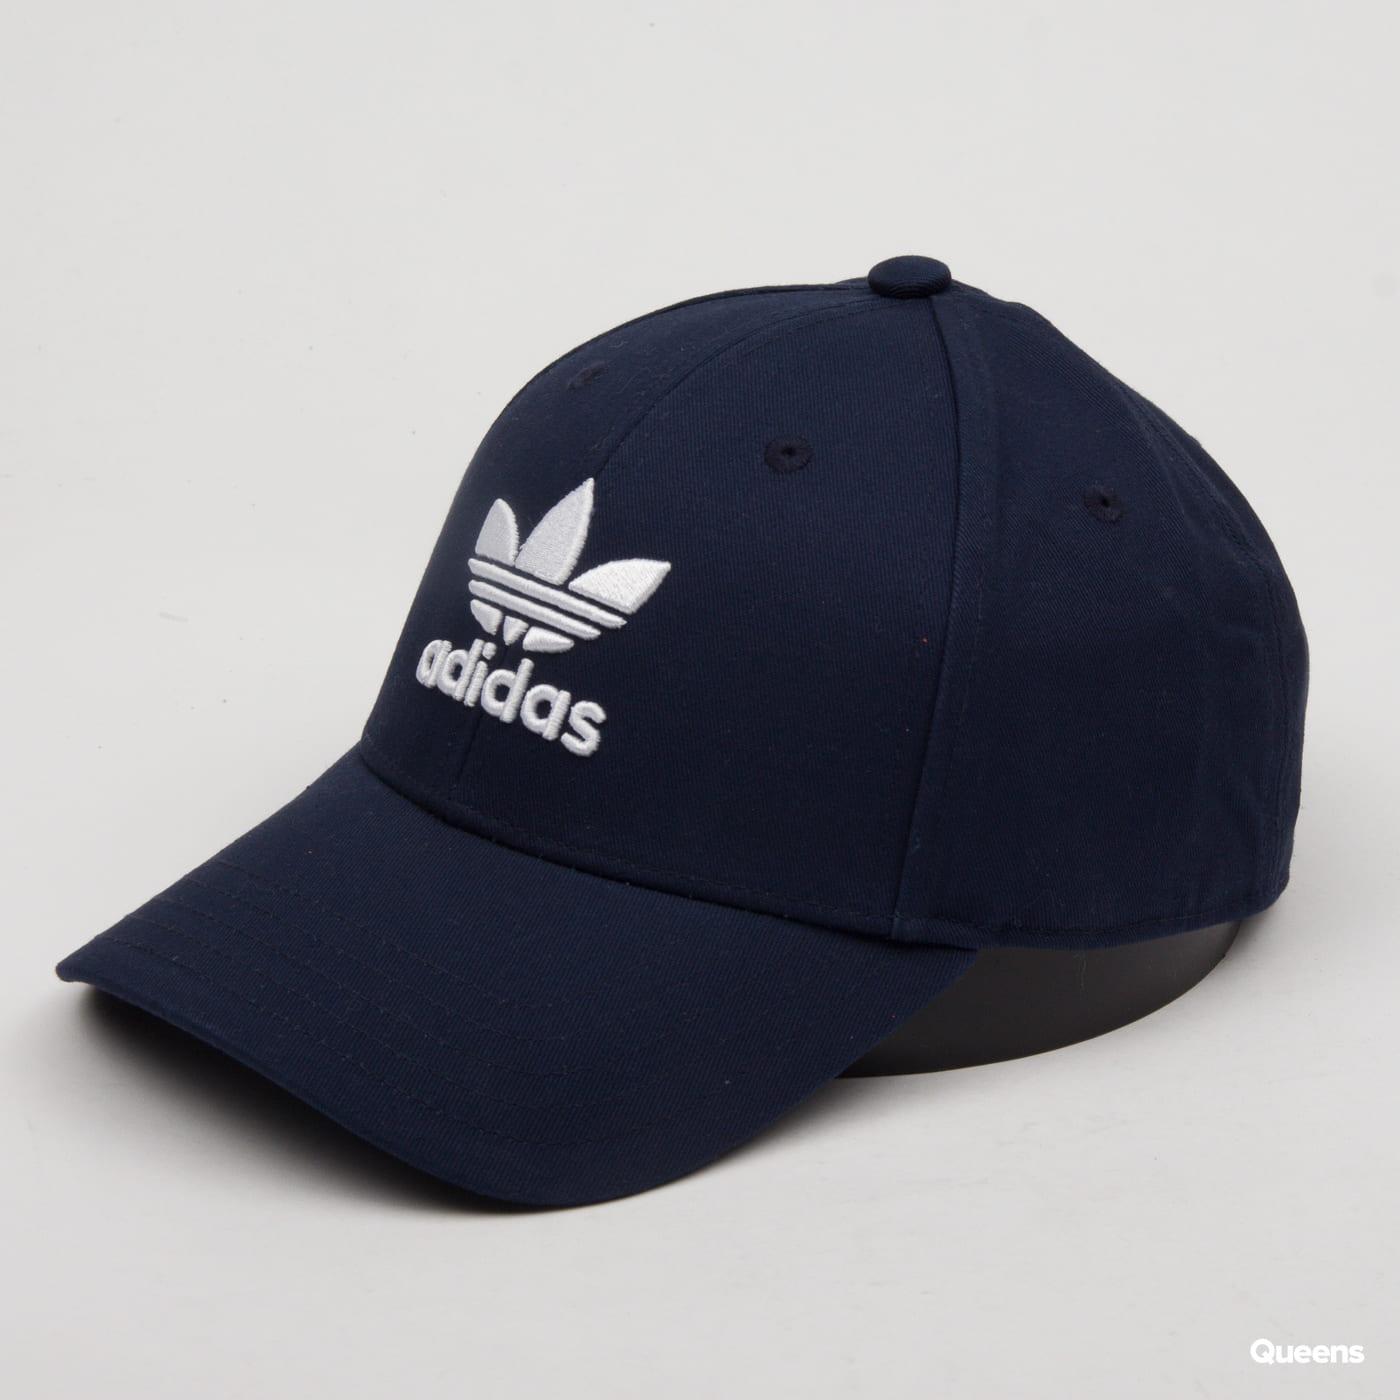 2e07a03ce Šiltovka adidas Originals Trefoil Baseball Cap navy (DV0174) – Queens 💚